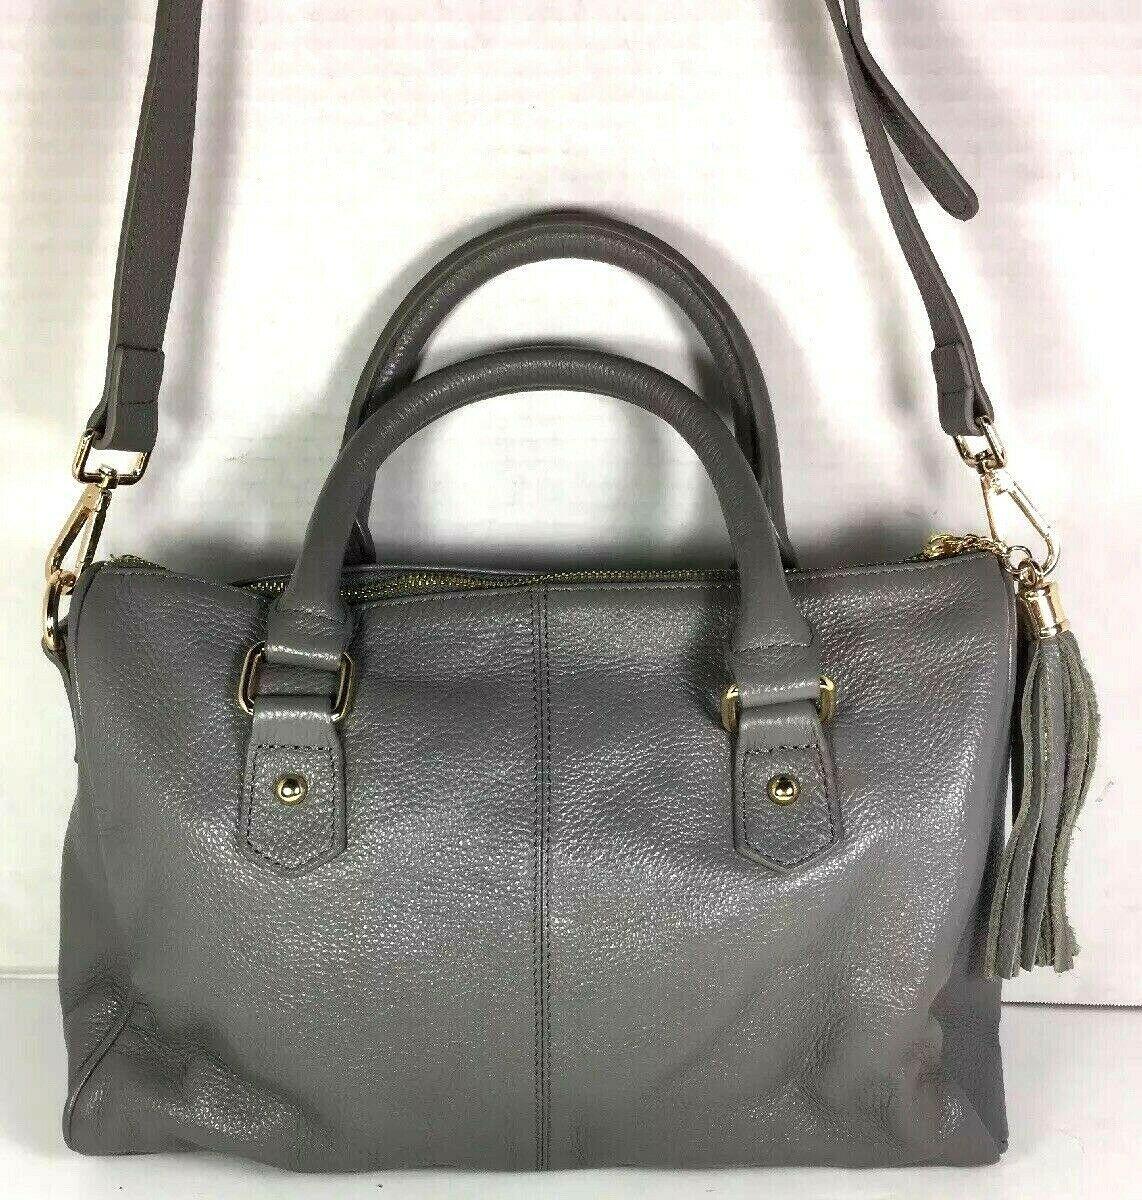 Erica Anenberg Grey Leather Cross Body Satchel Shoulder Bag image 2